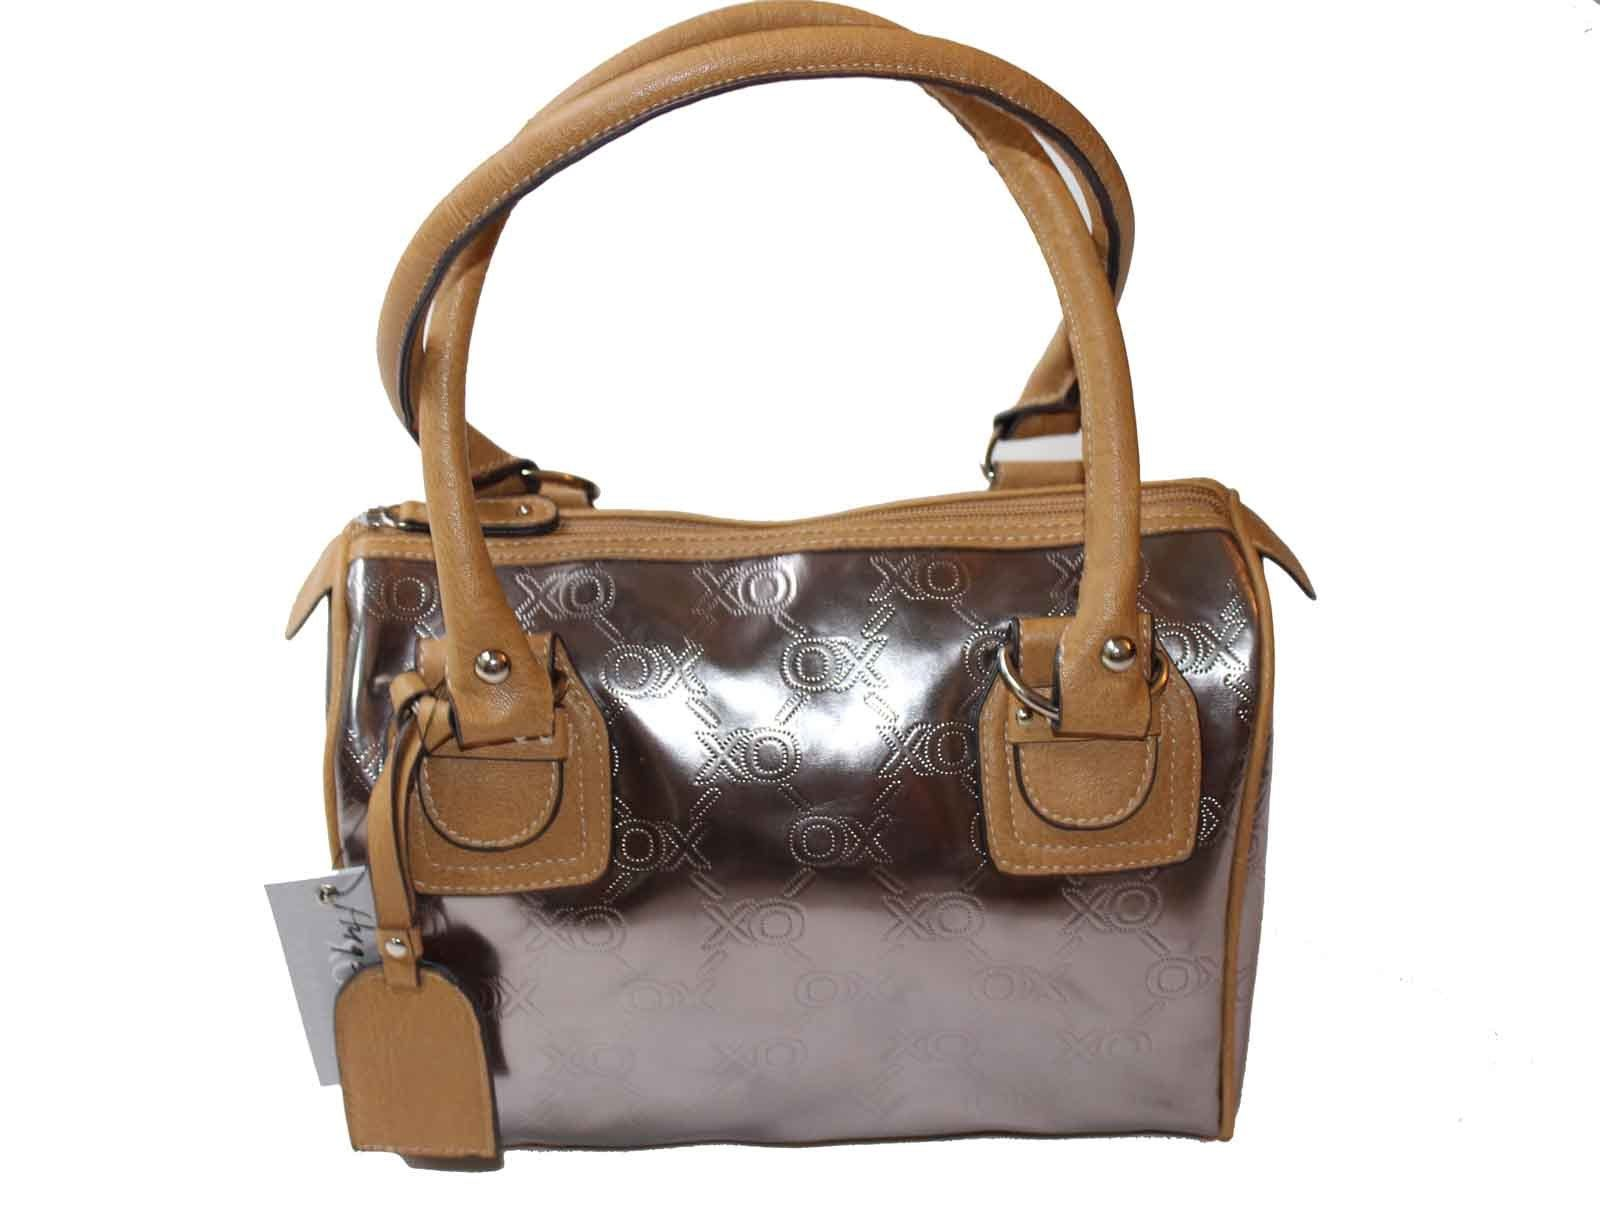 xoxo purse navy purse wine purse